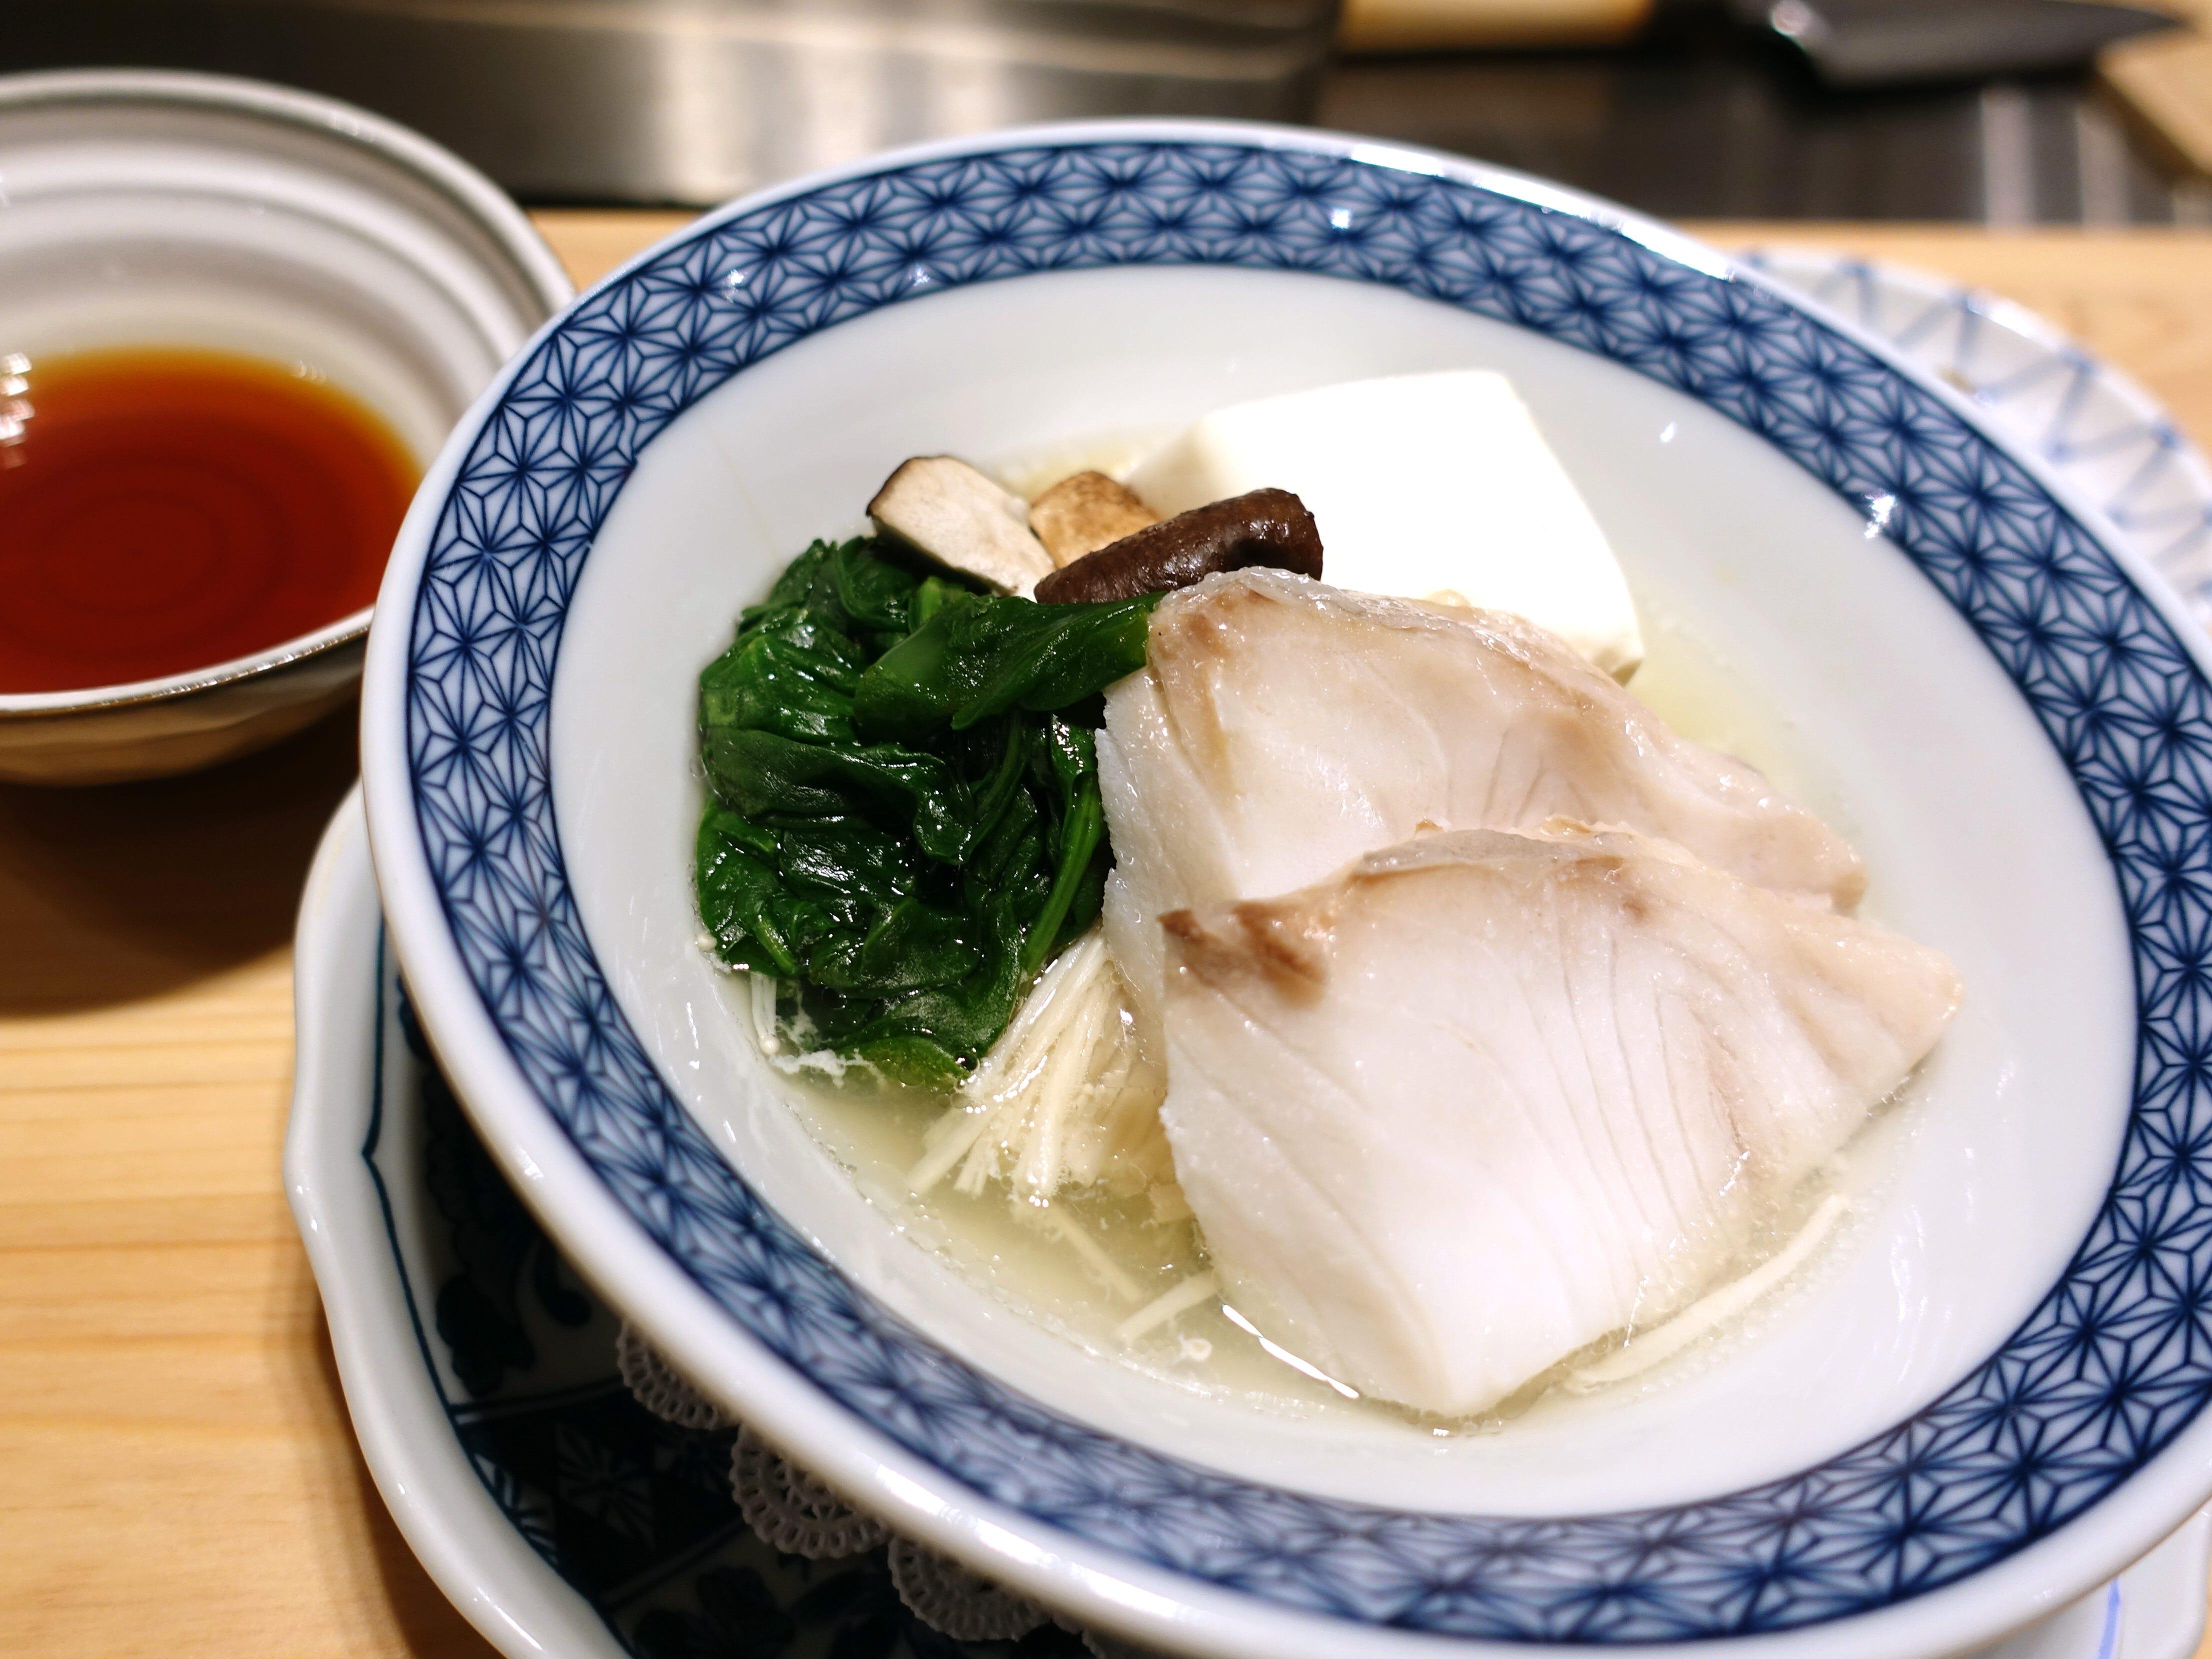 Chiri mushi with sake-steamed cod, spinach, tofu, enoki and shiitake mushrooms with ponzu at ShinBay in Scottsdale.